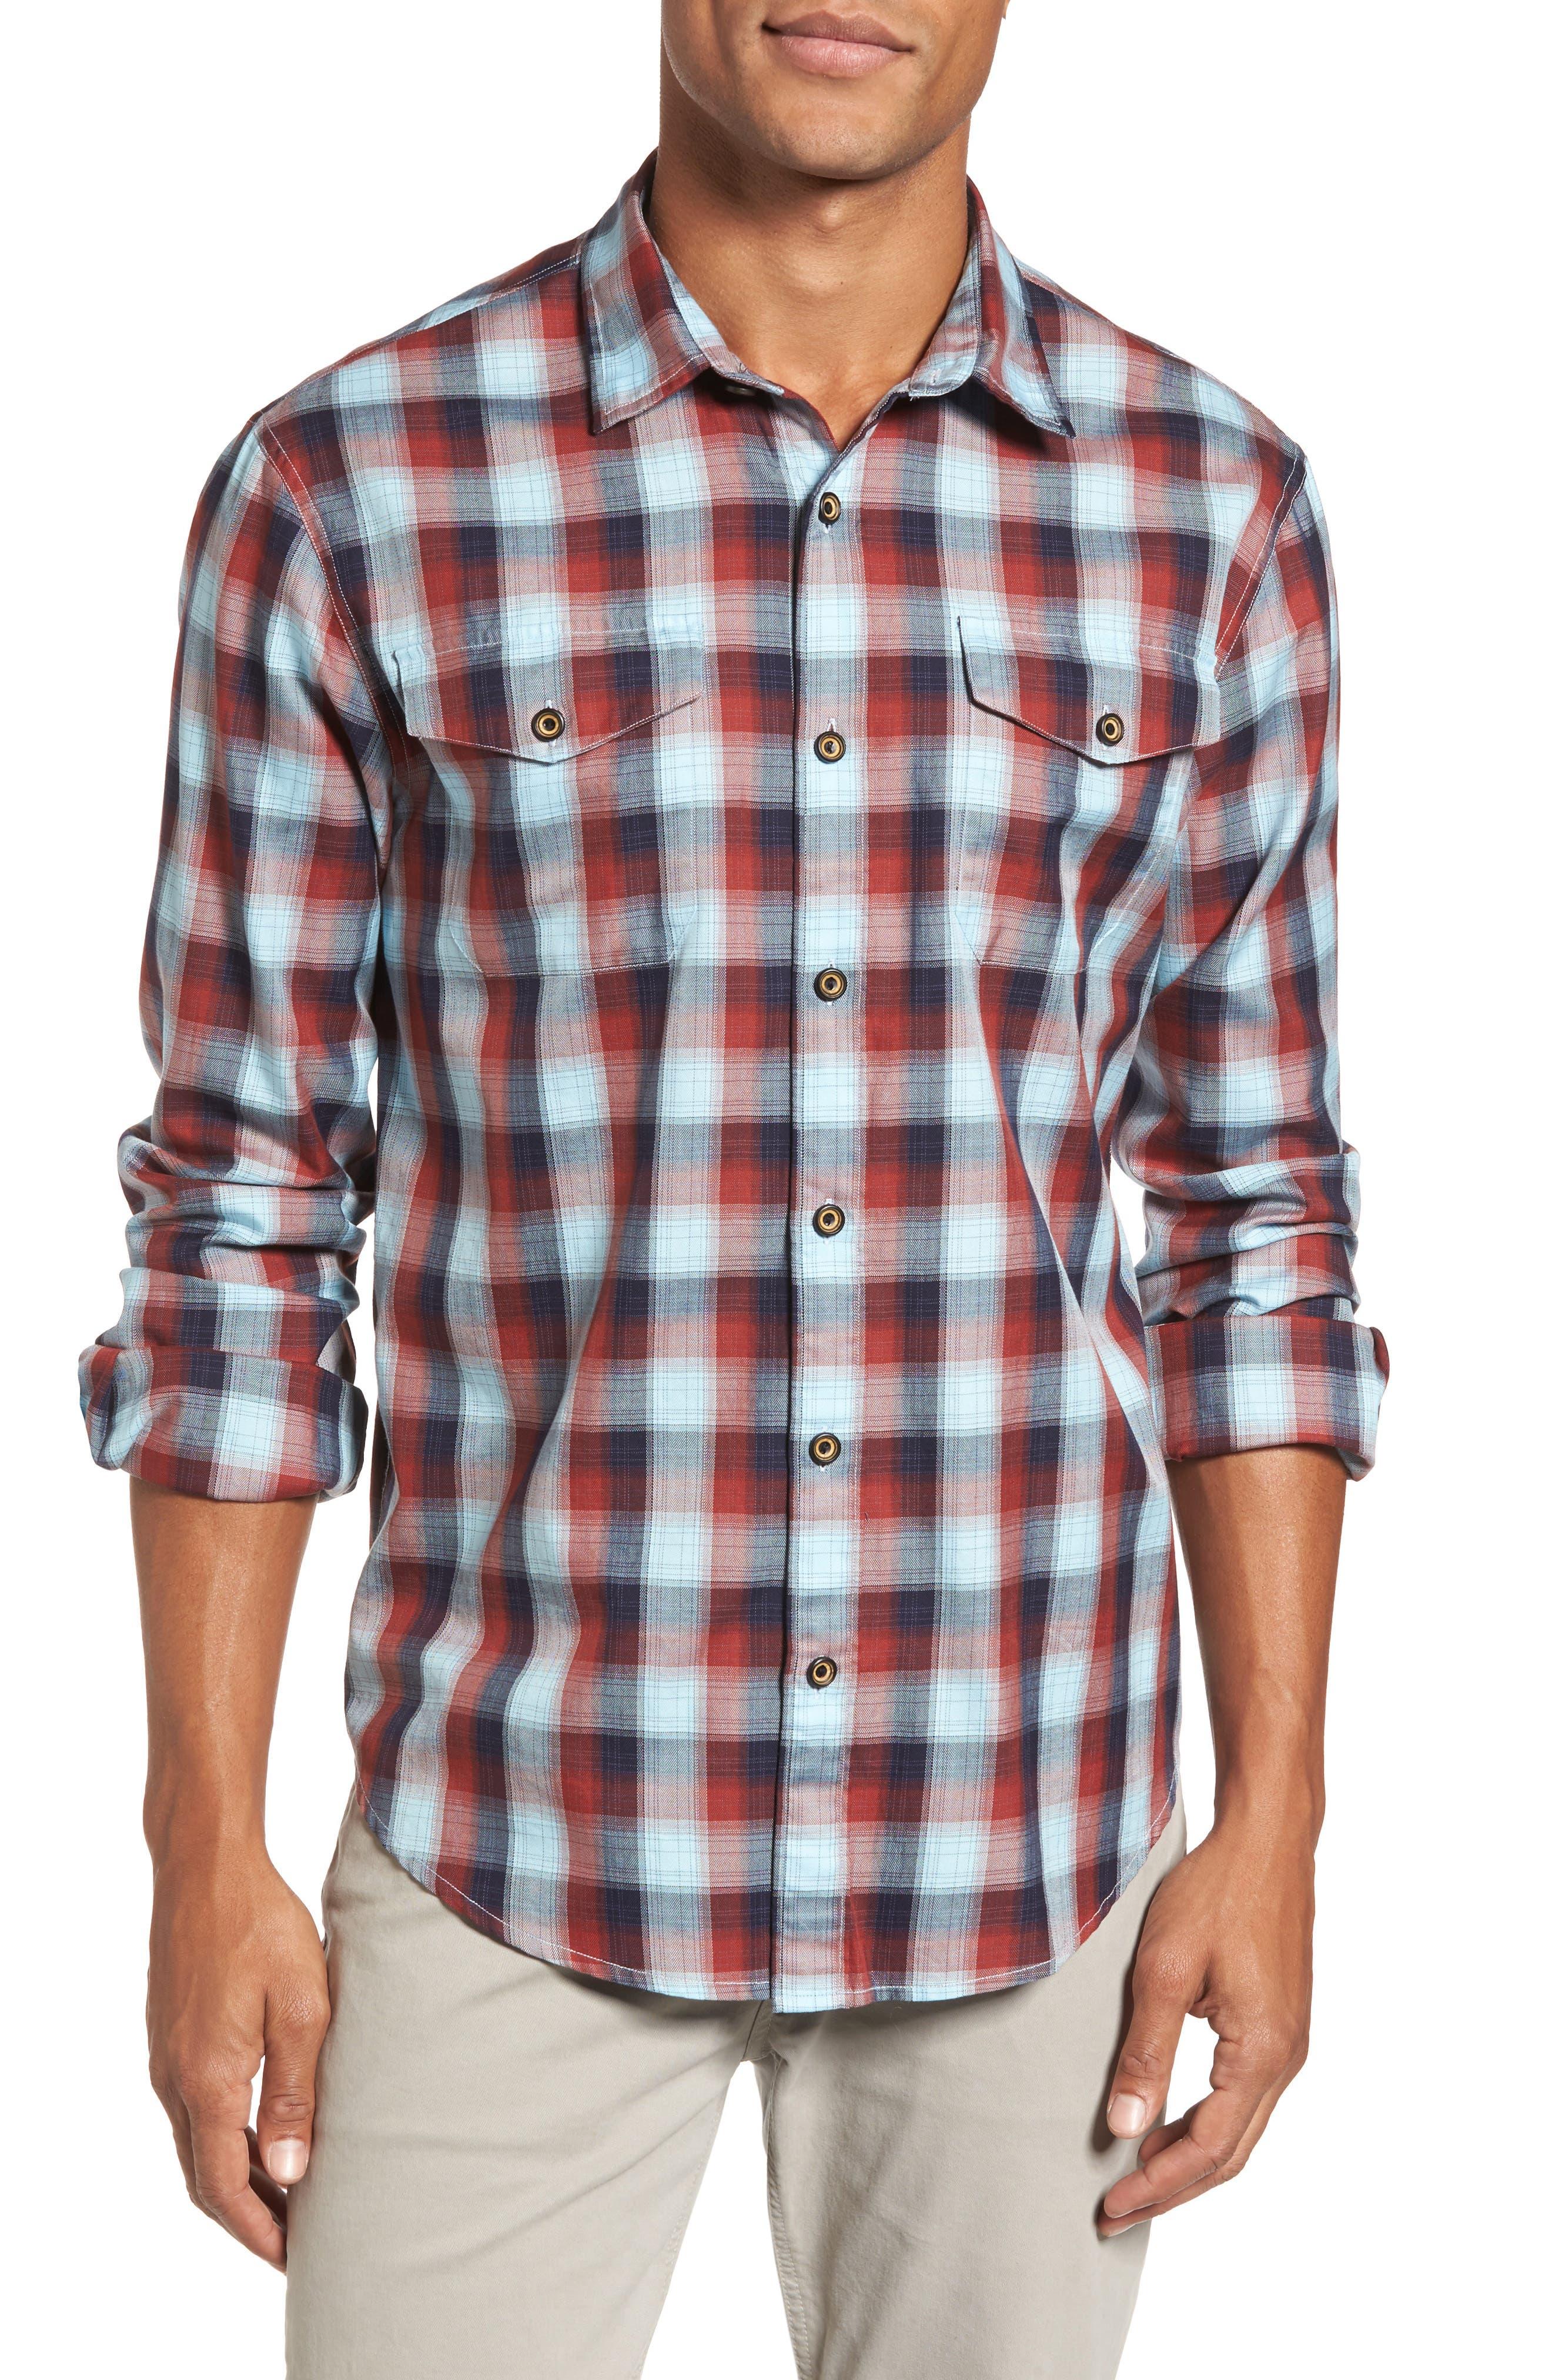 Alternate Image 1 Selected - Coastaoro Redford Check Flannel Shirt